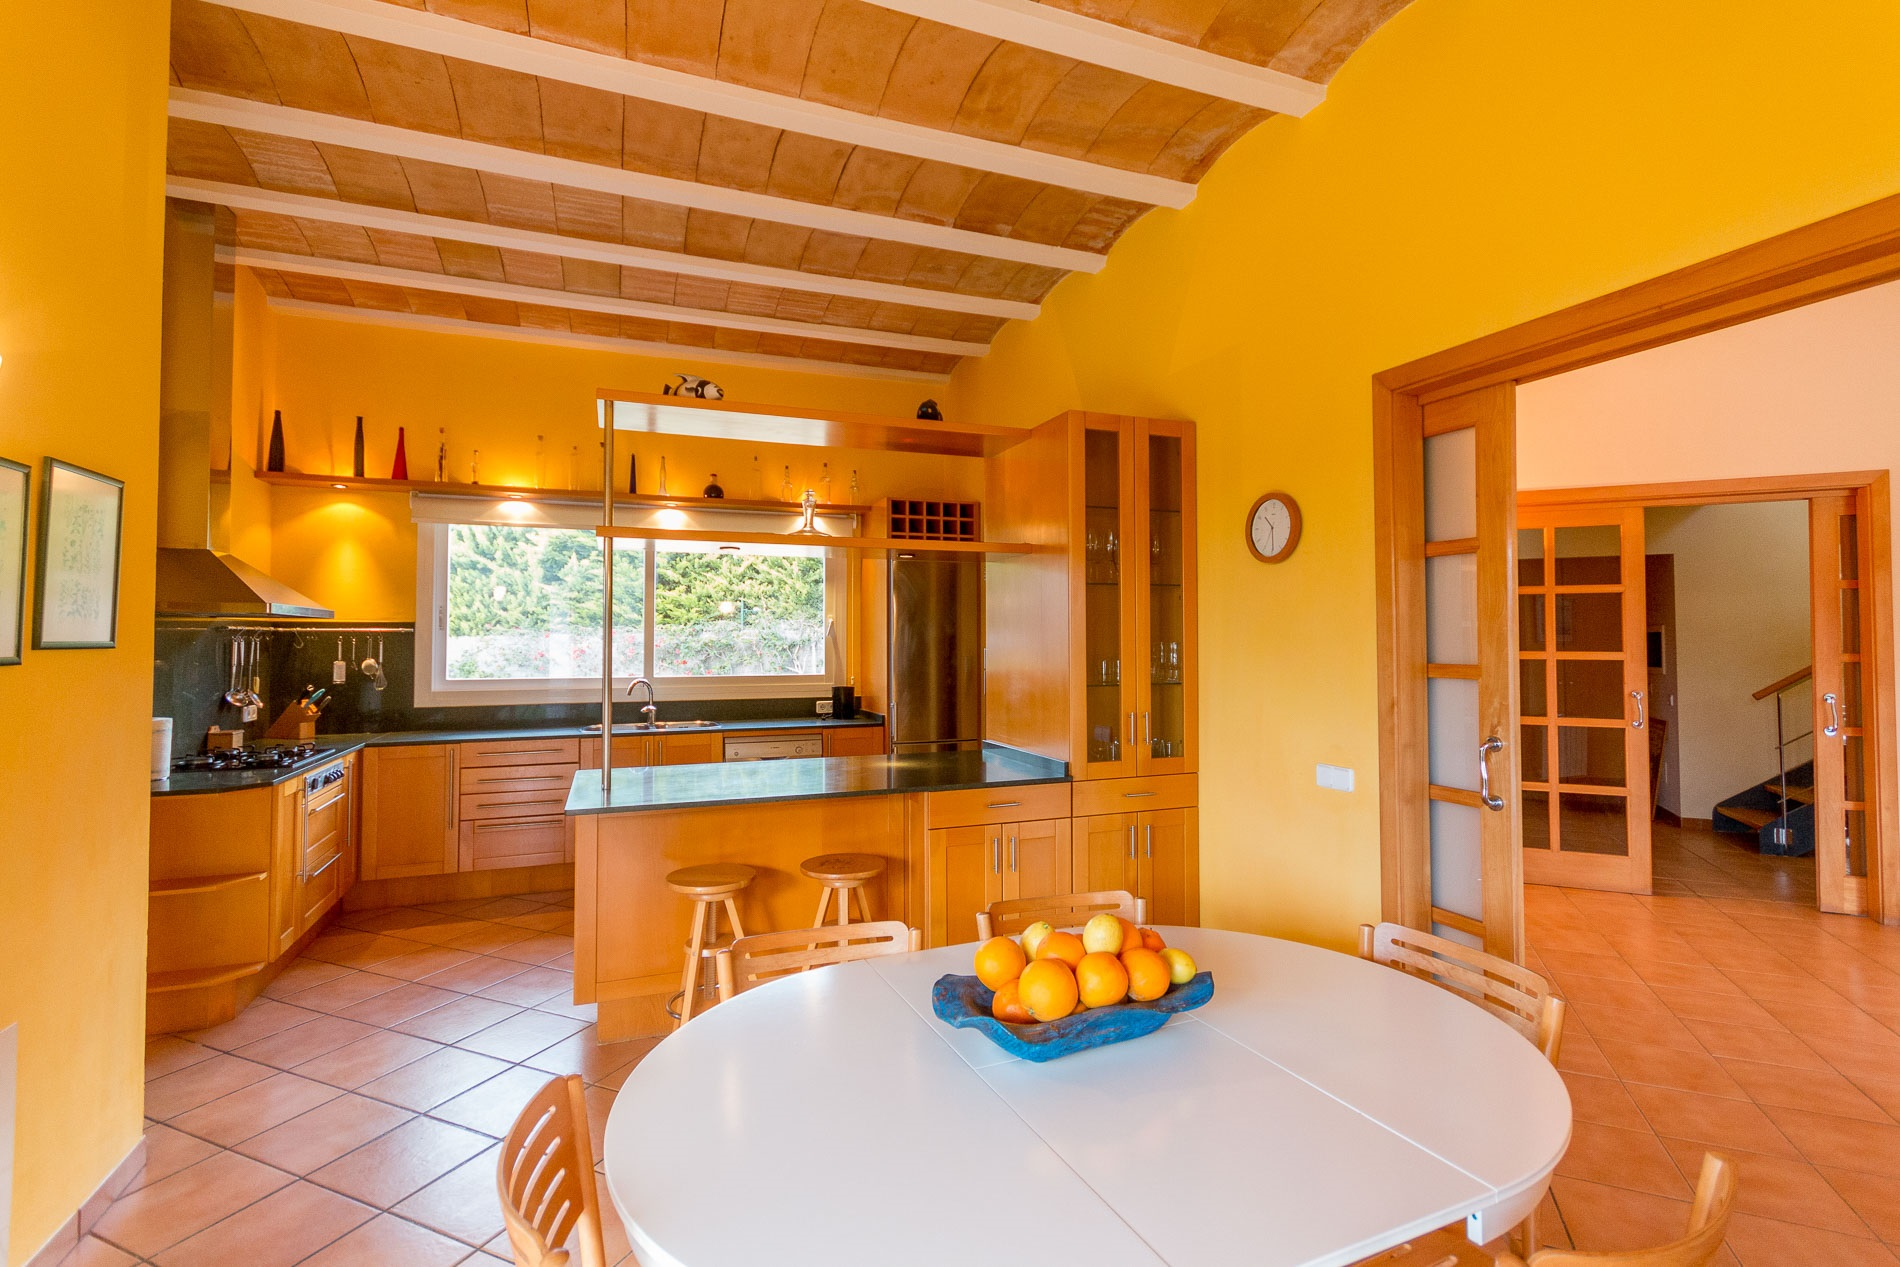 Charmante villa in de populaire wijk van Ibiza